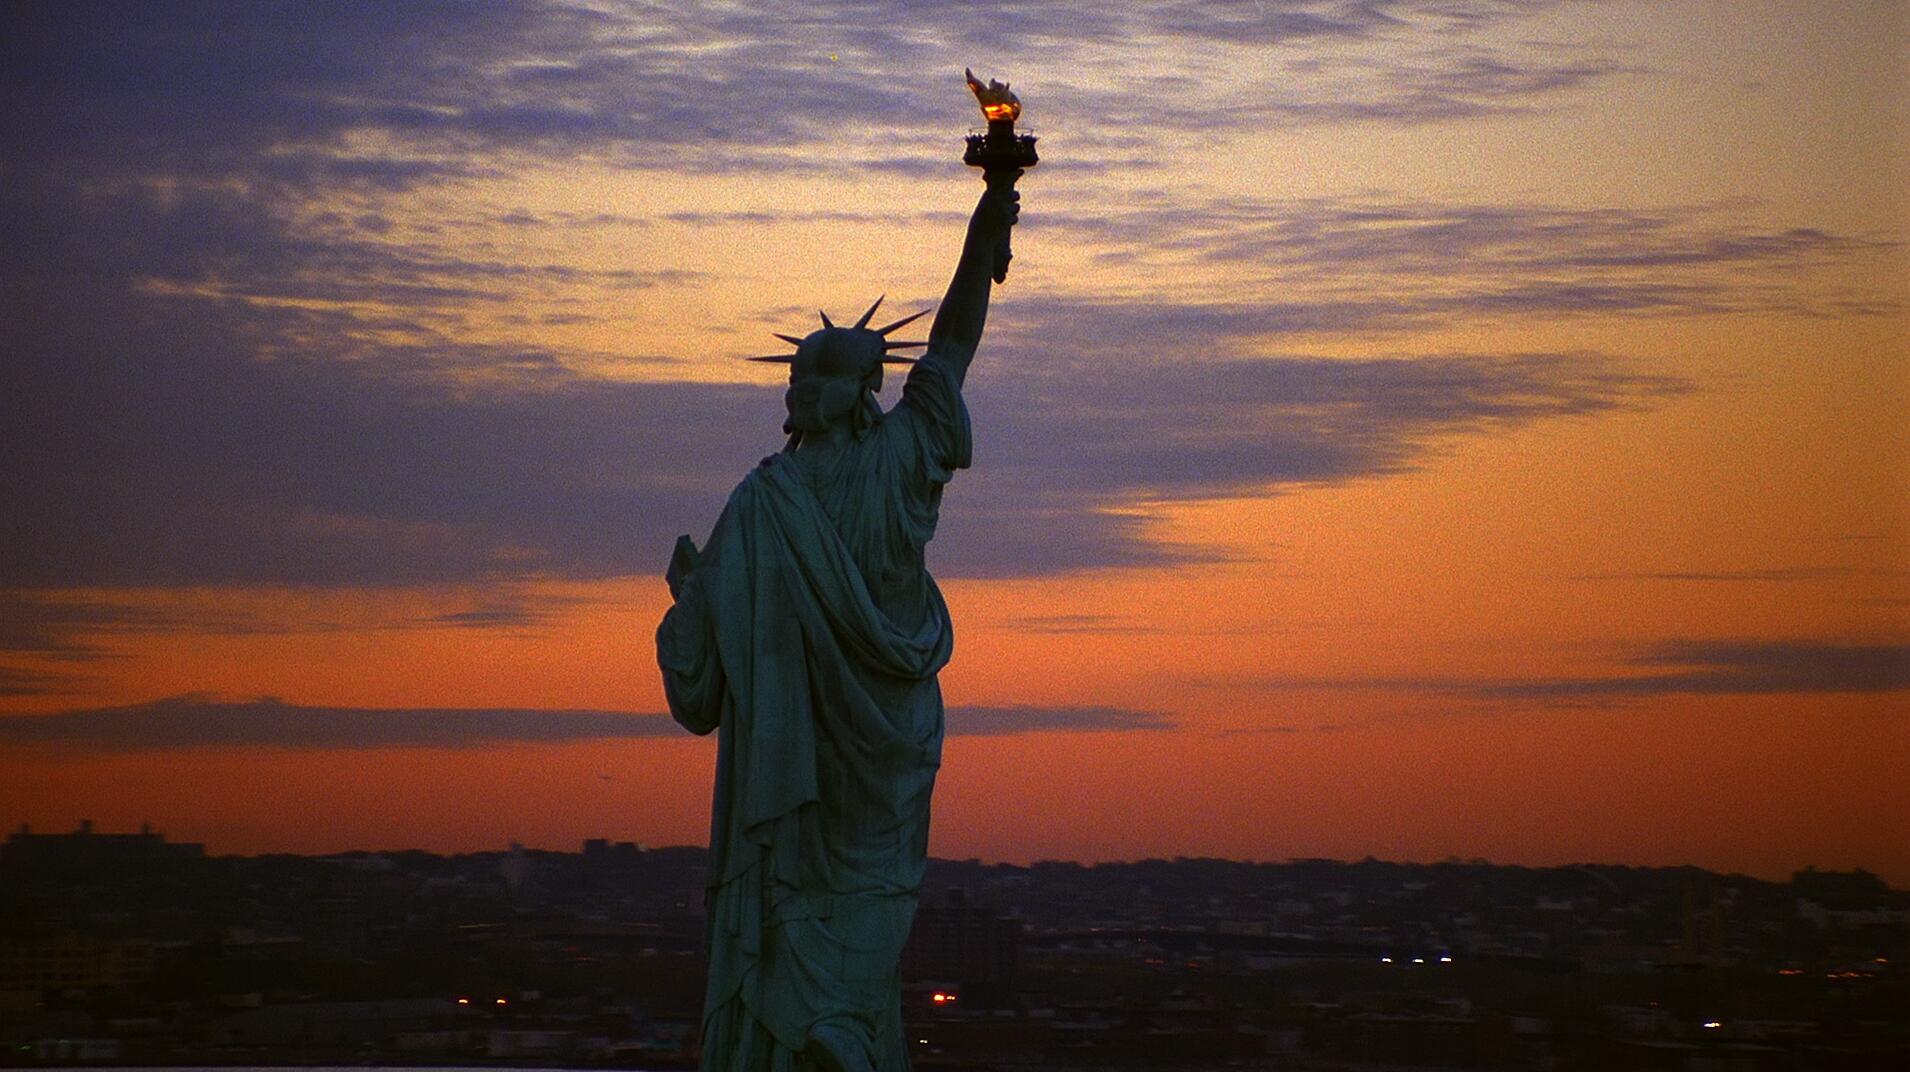 American Exemplarism Over American Exceptionalism